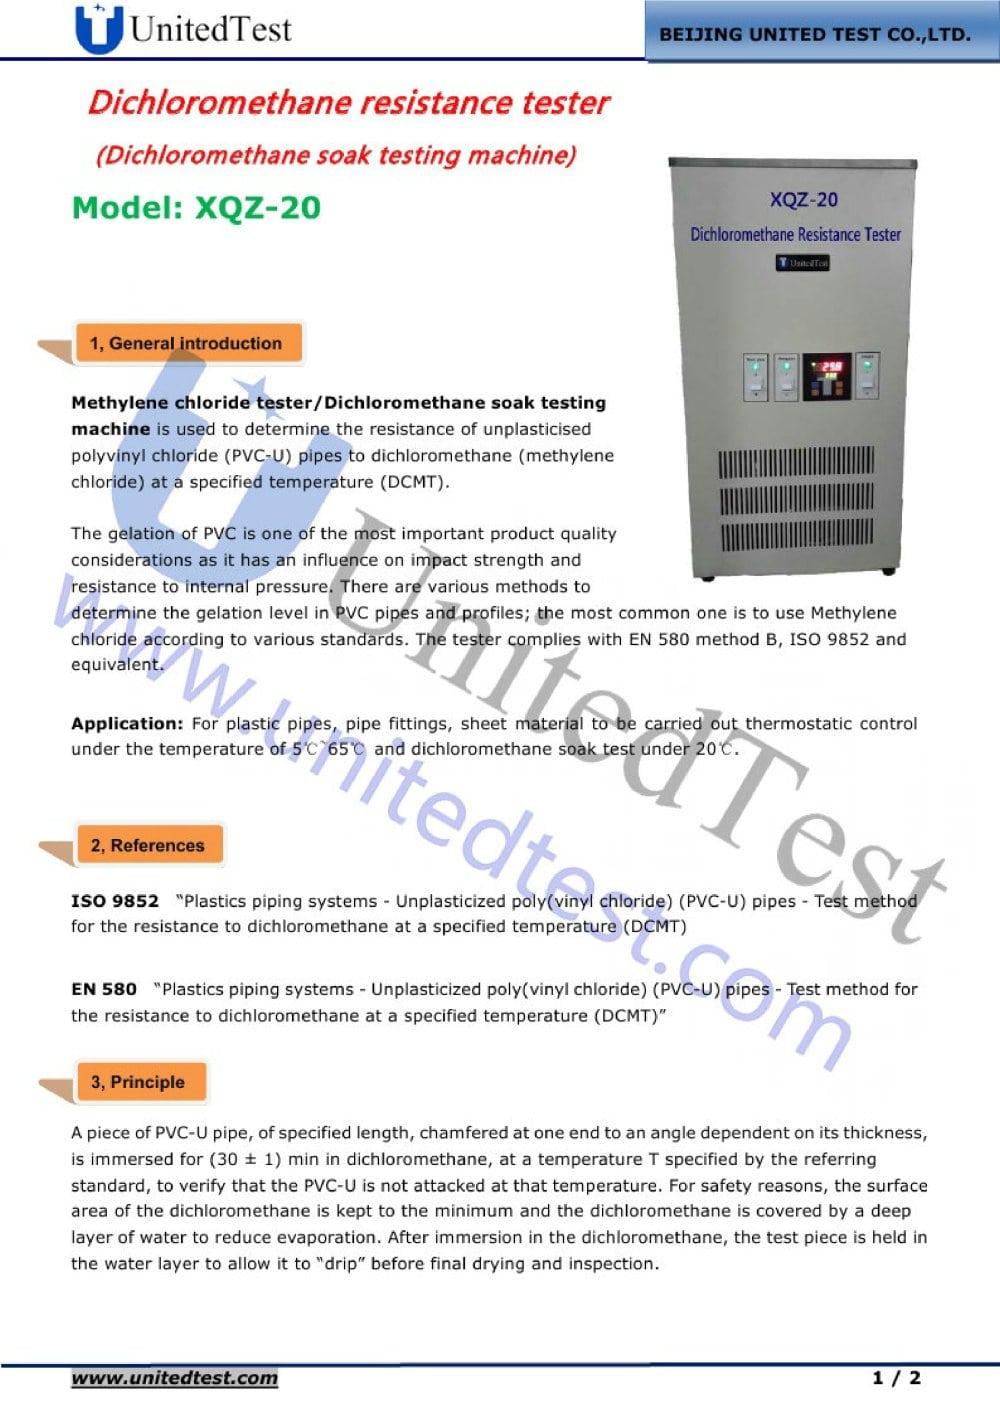 dichloromethane resistance tester beijing united test co ltd